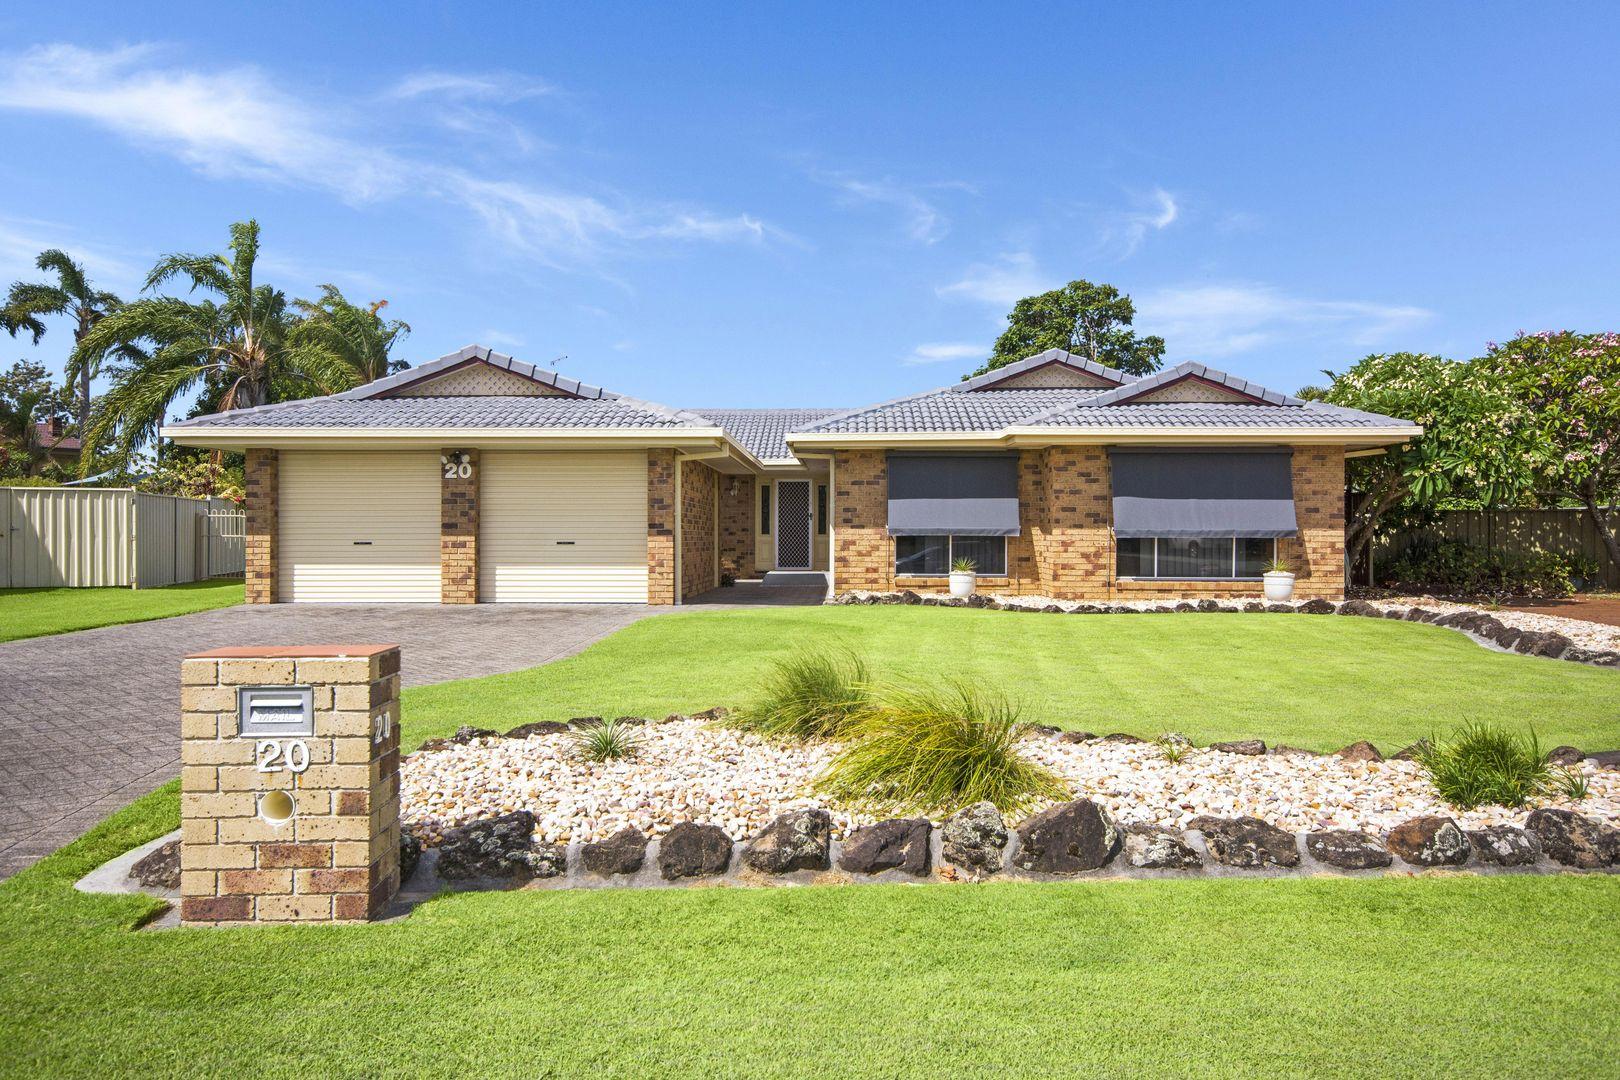 20 Admiralty Court, Yamba NSW 2464, Image 0